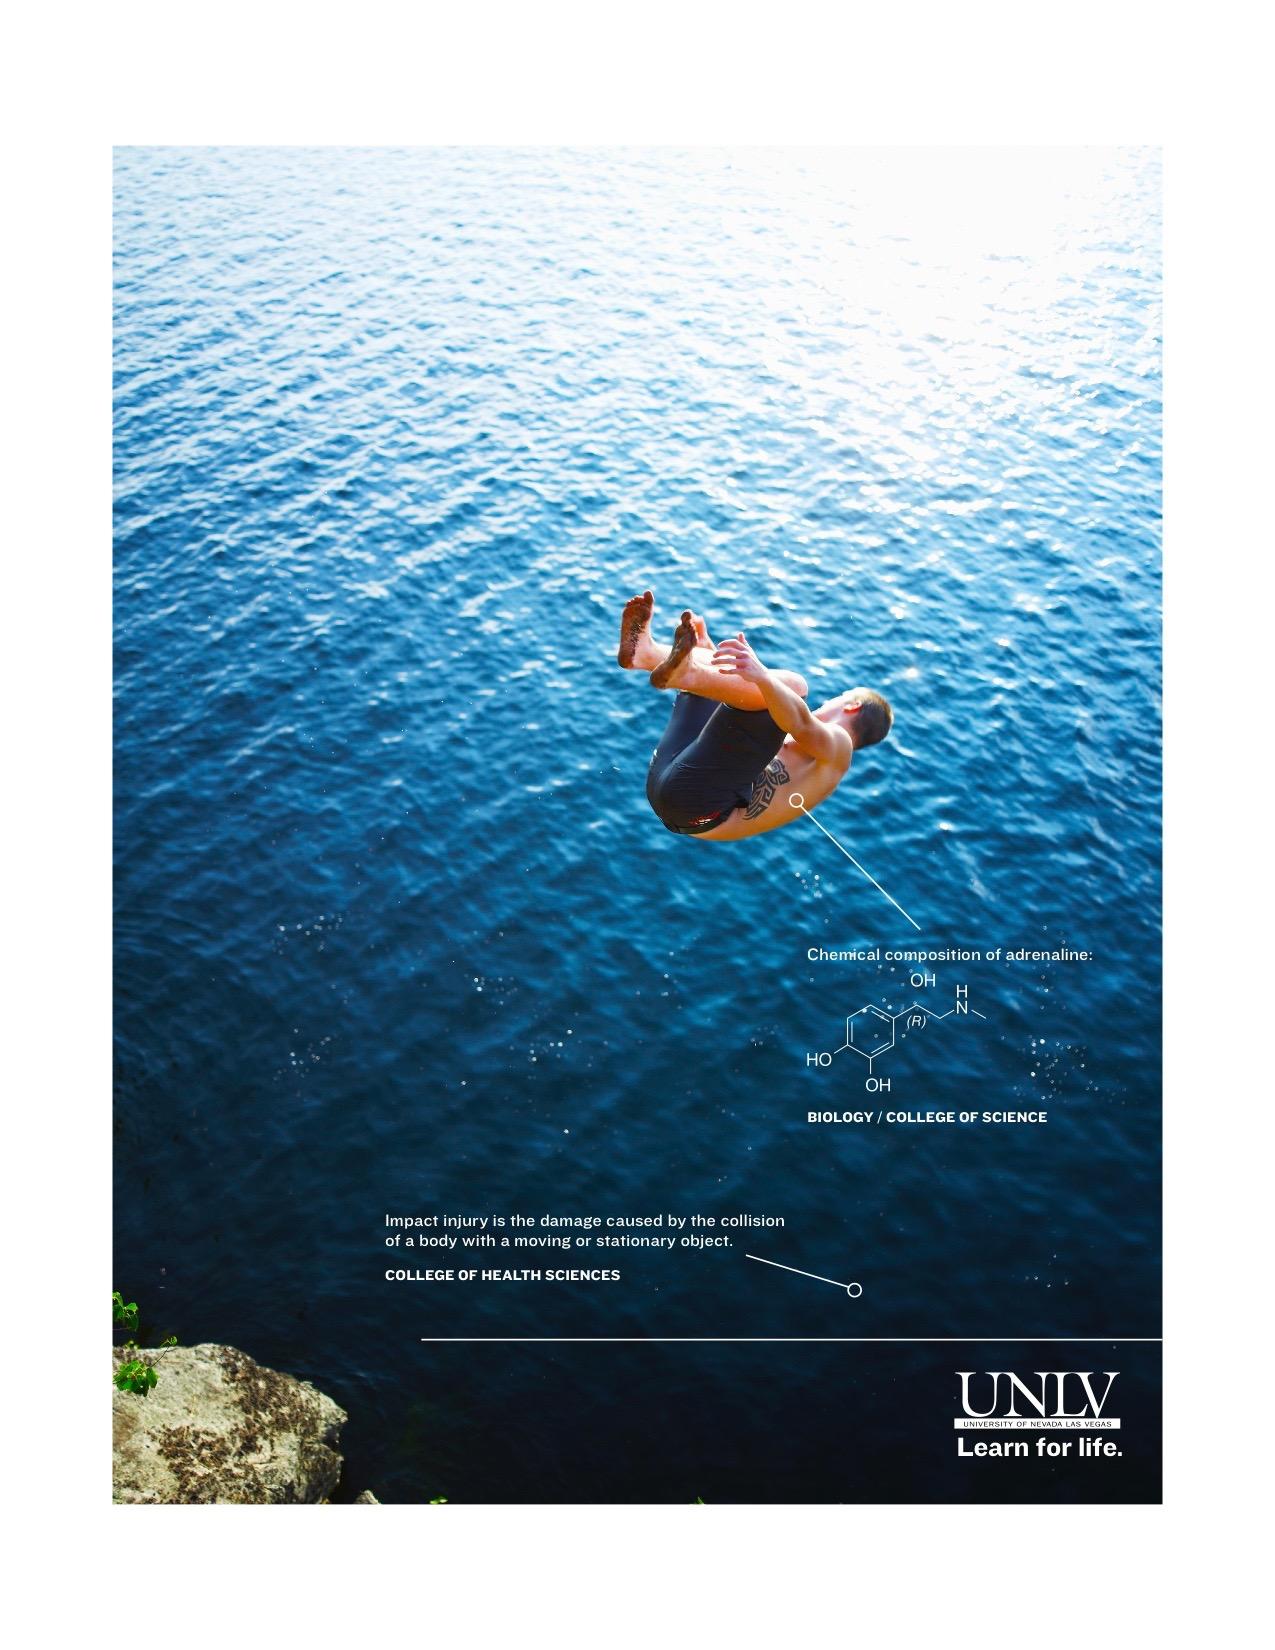 UNLV Branding